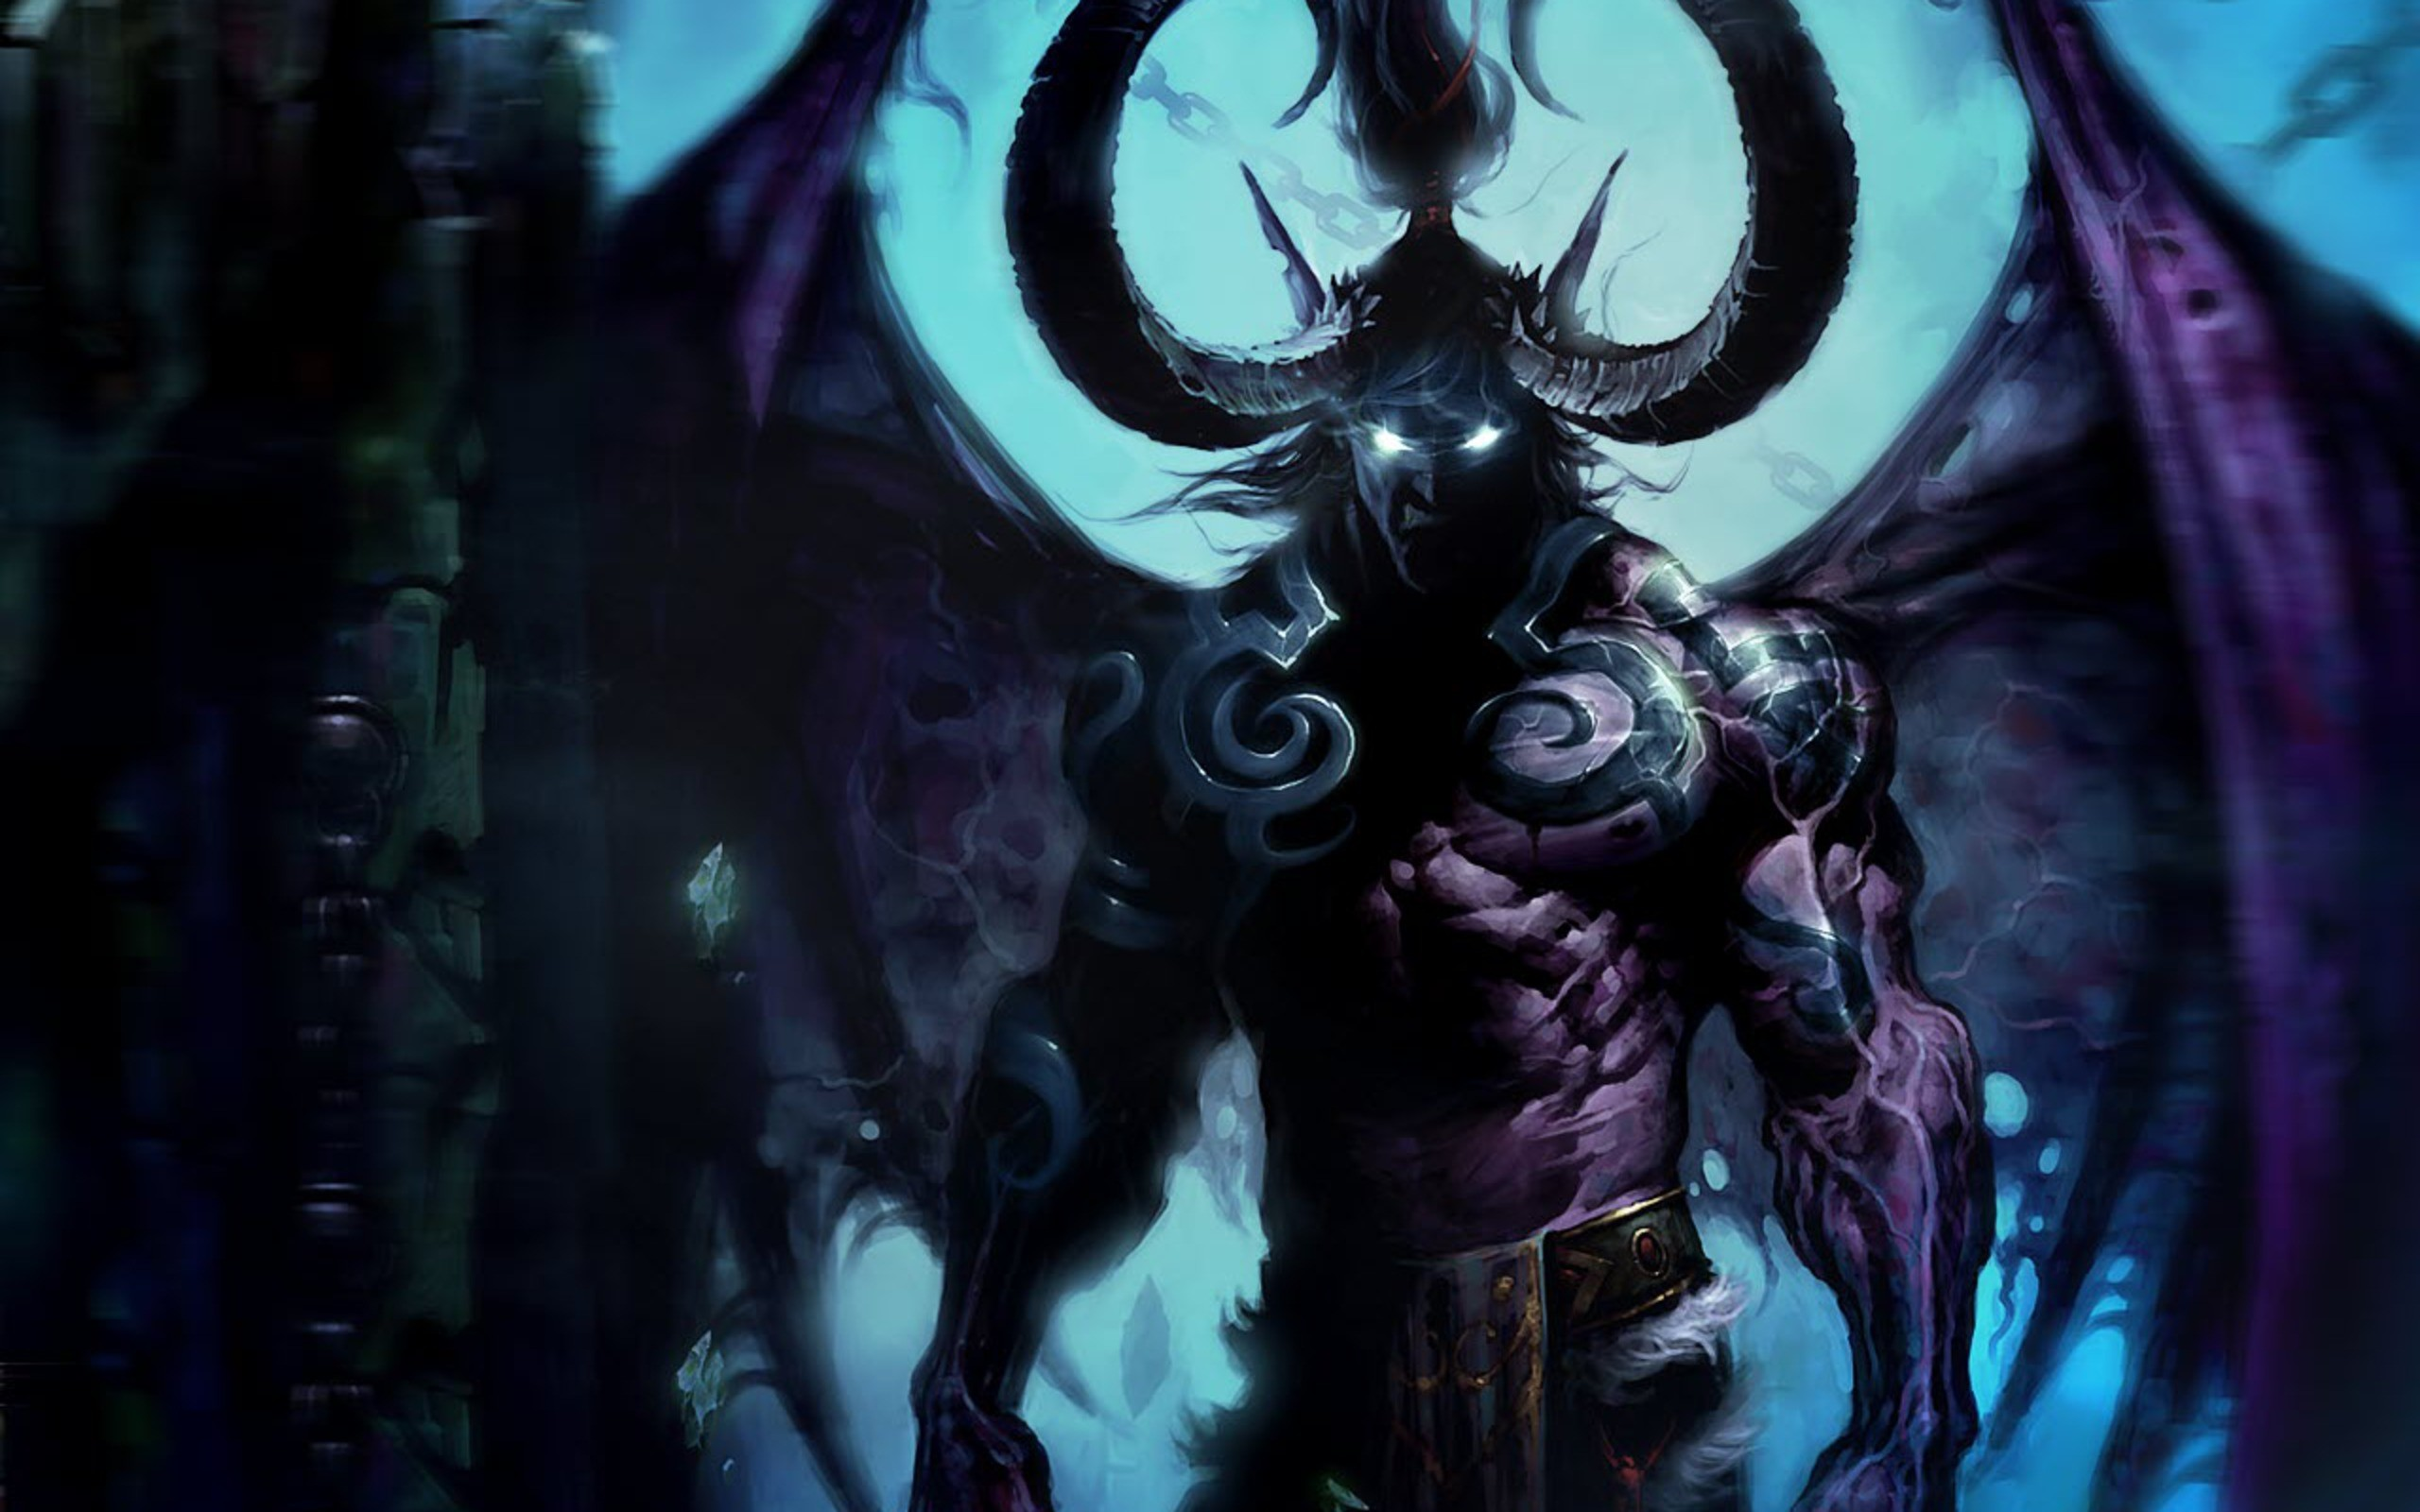 Demon Wallpaper by Slavasan Lynam on FL | Fantasy HDQ | 420.78 KB